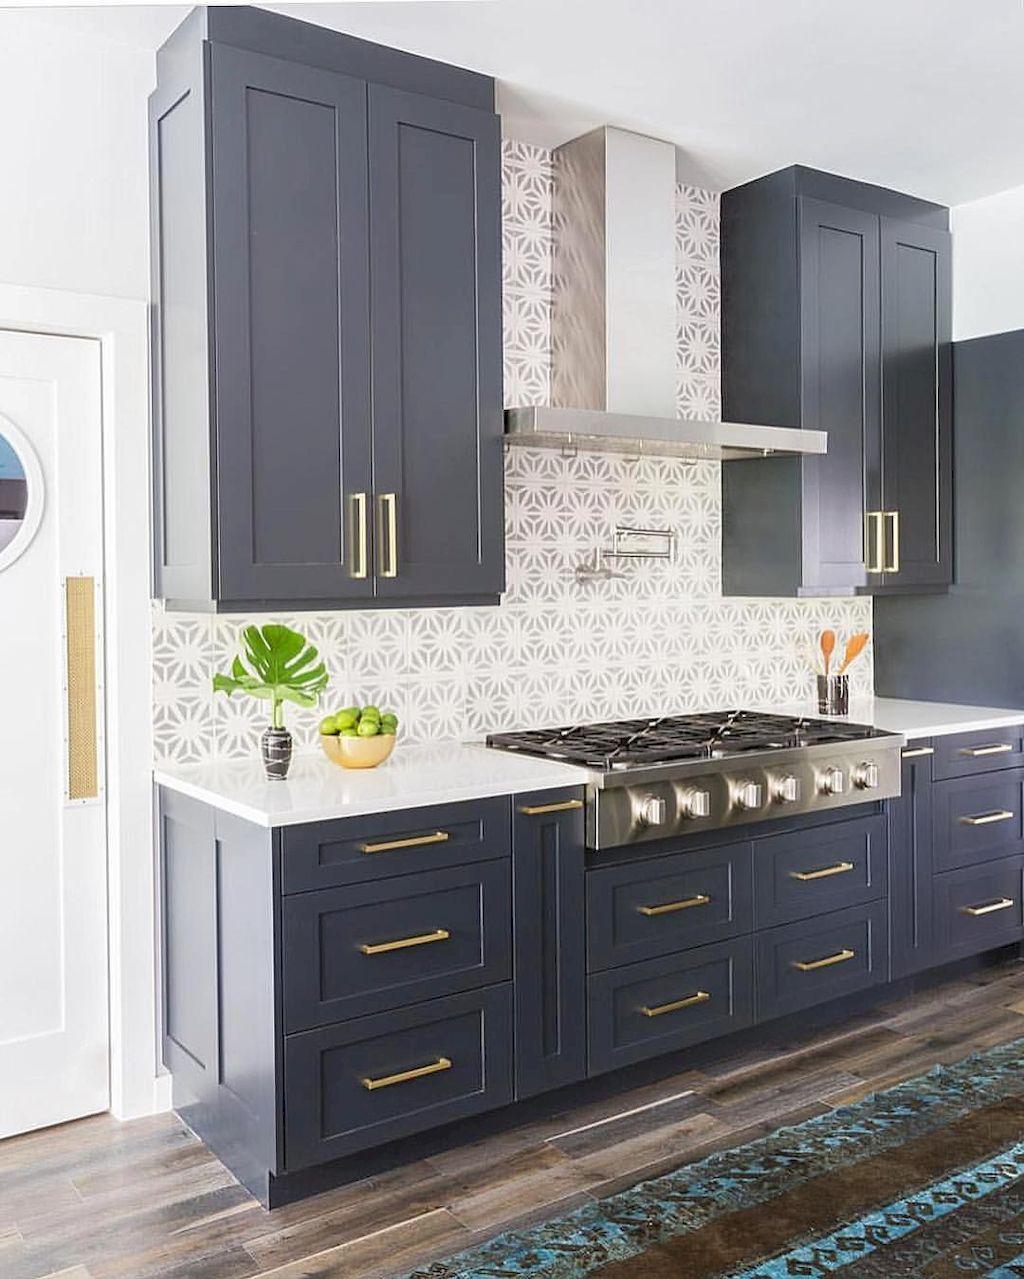 75 Gray Kitchen Cabinet Decor Ideas #graykitchencabinets